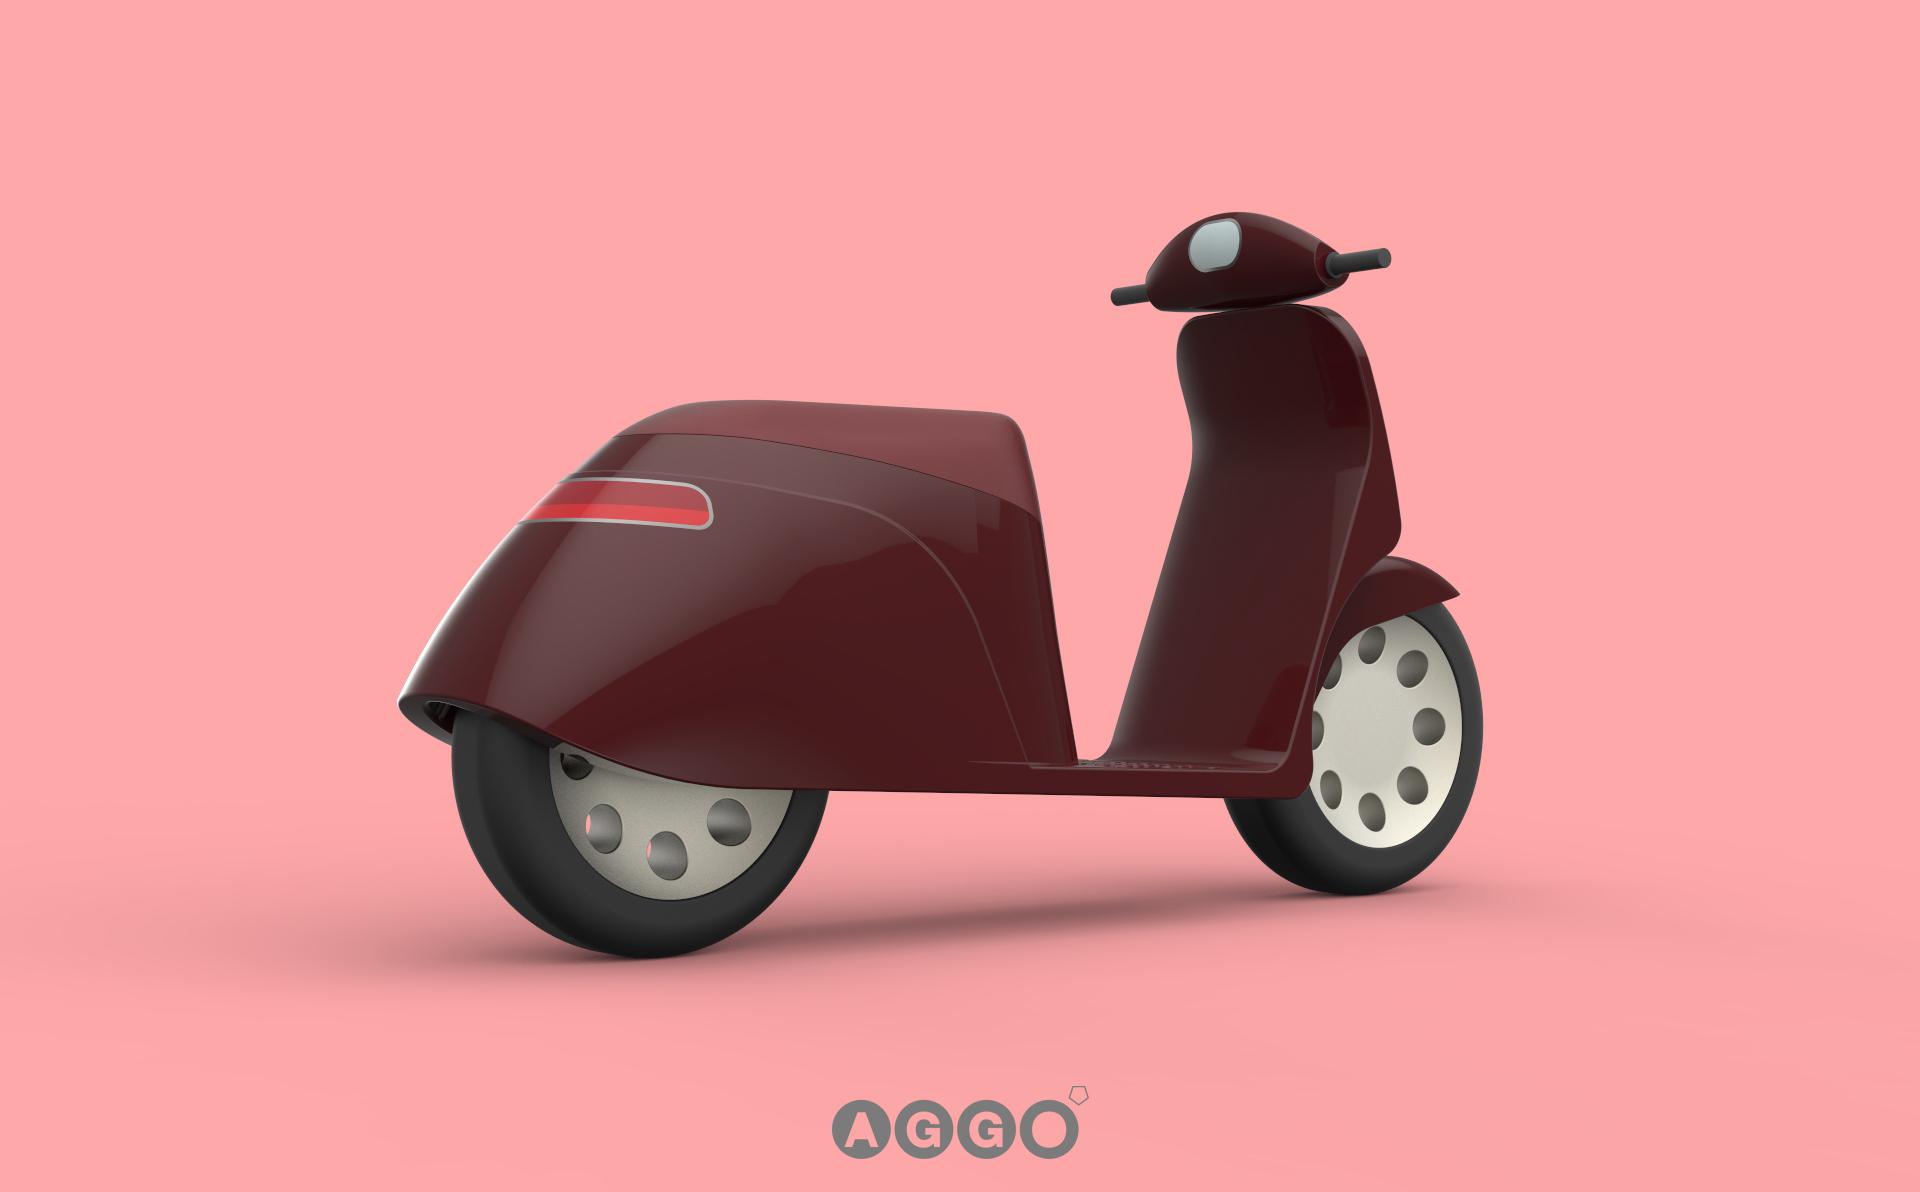 Electric_Bike_by_Aggo_014.jpg